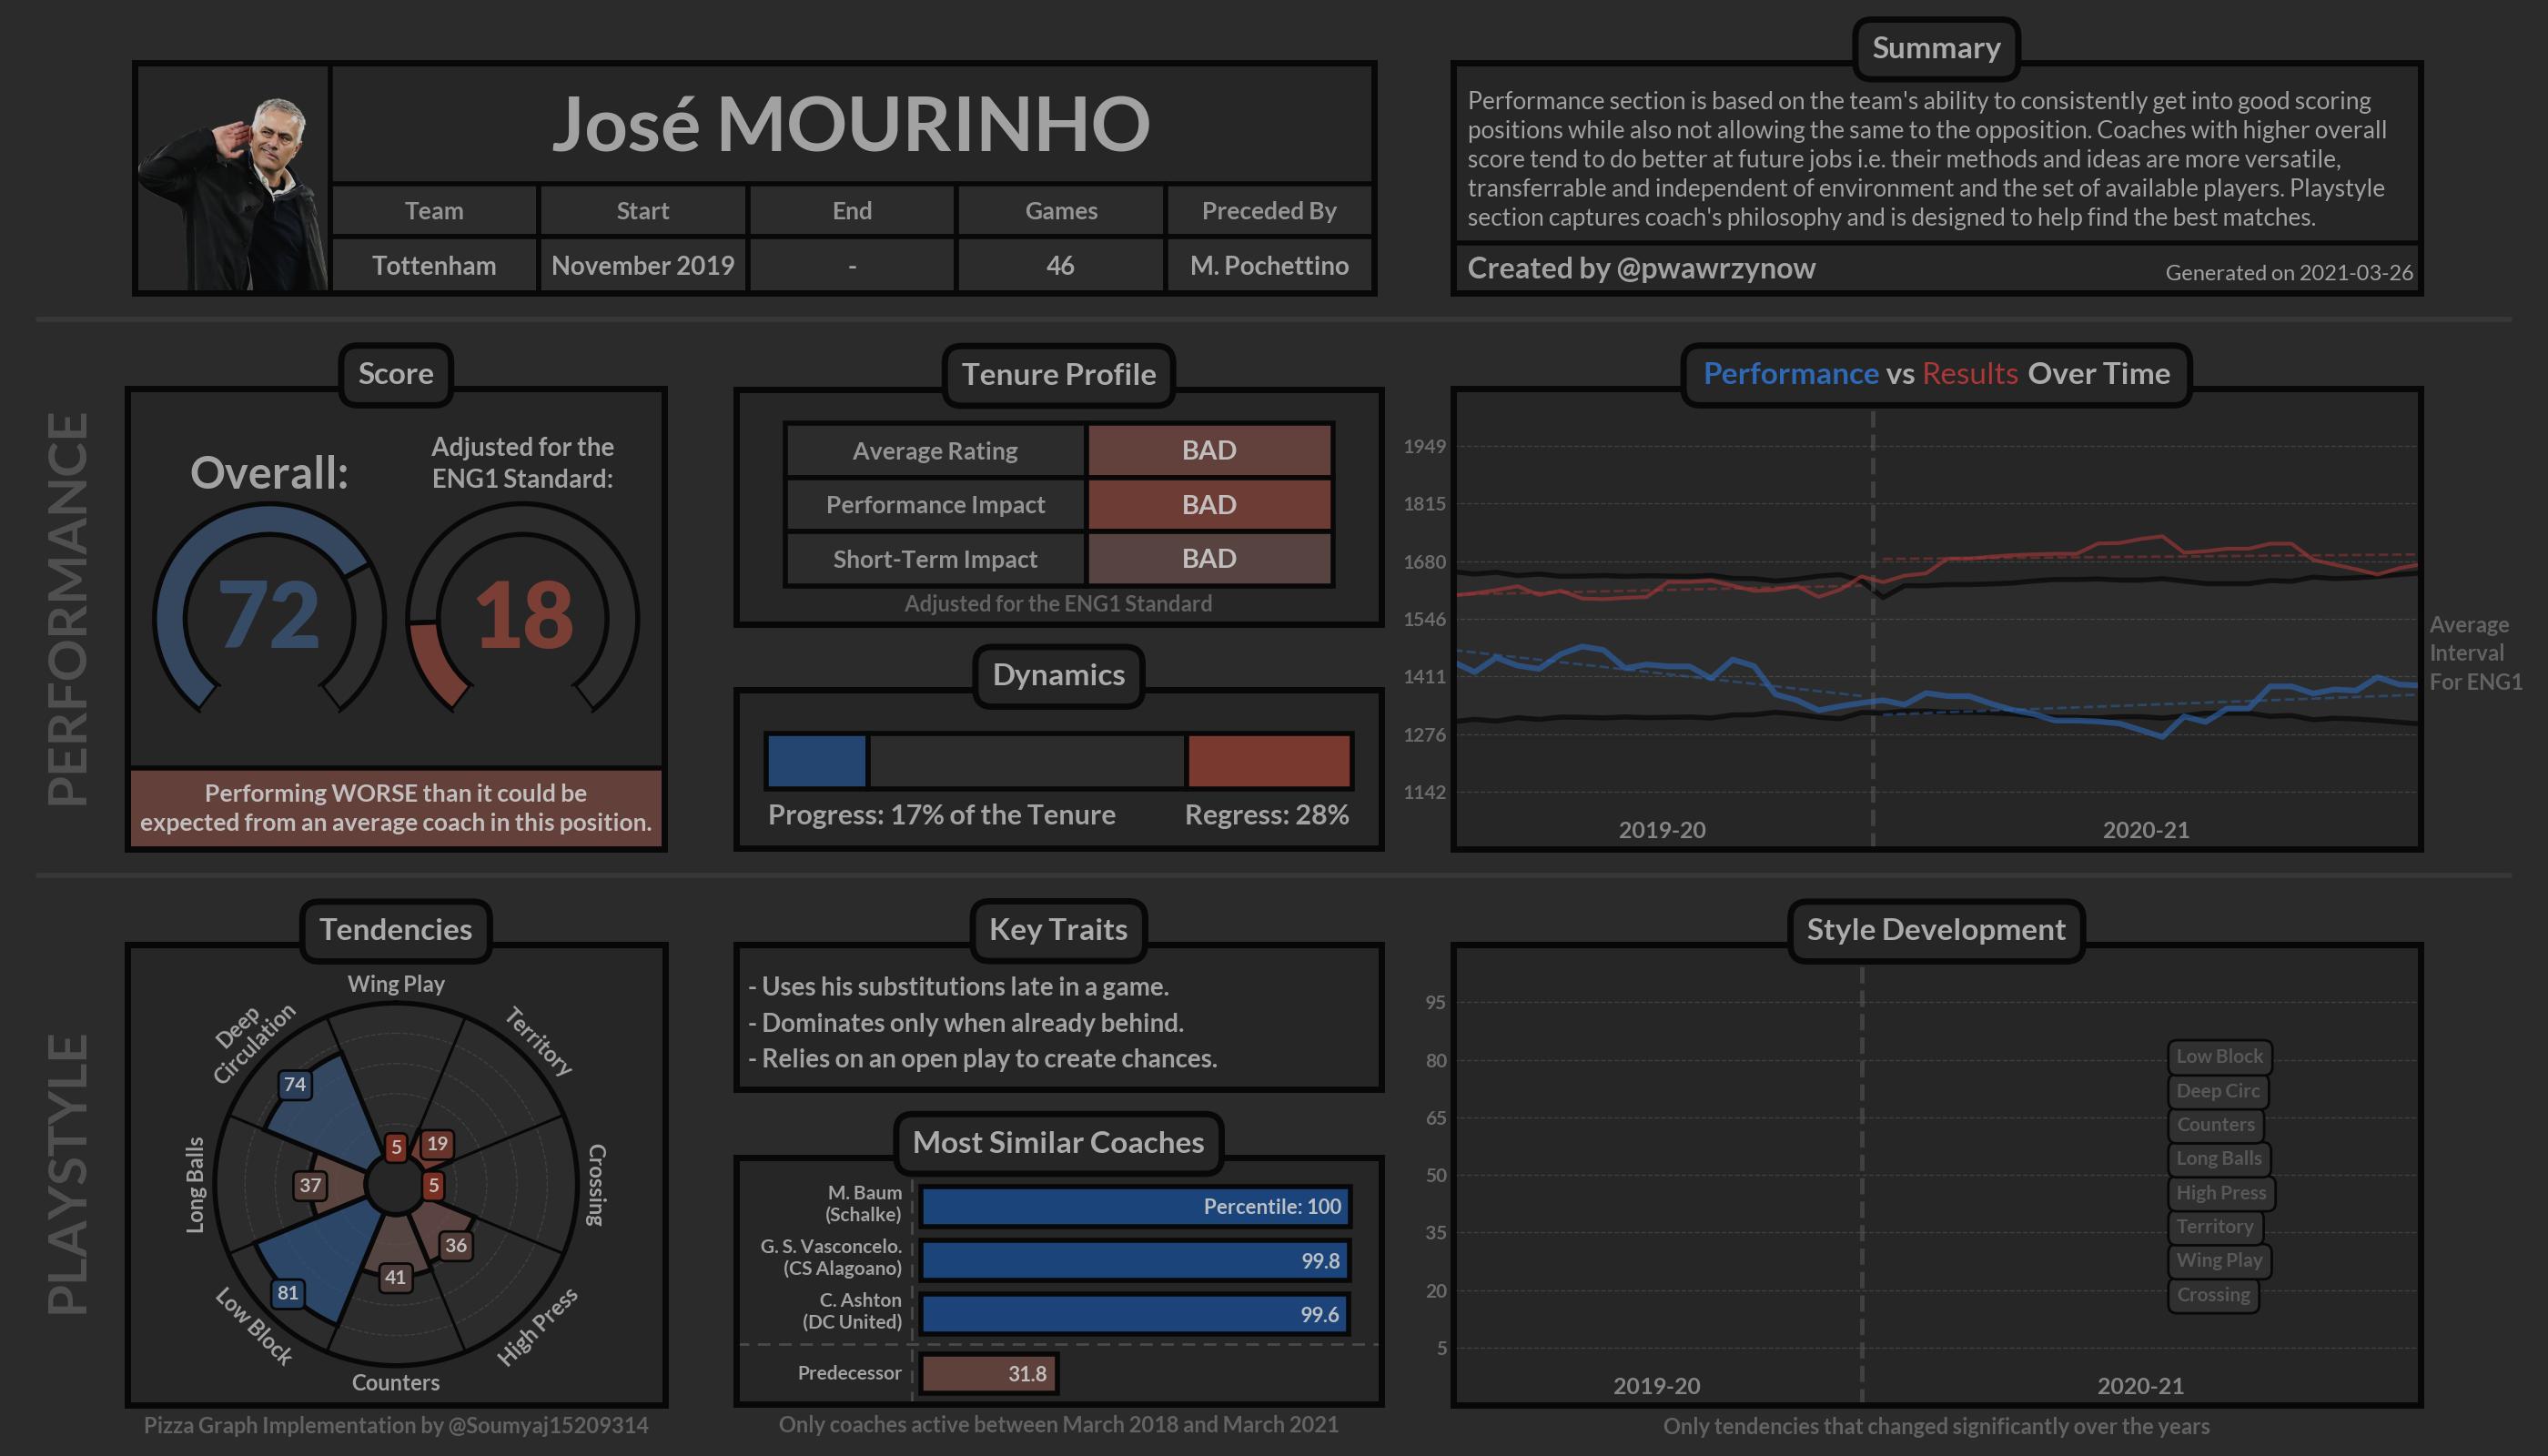 José MOURINHO_Tottenham.png